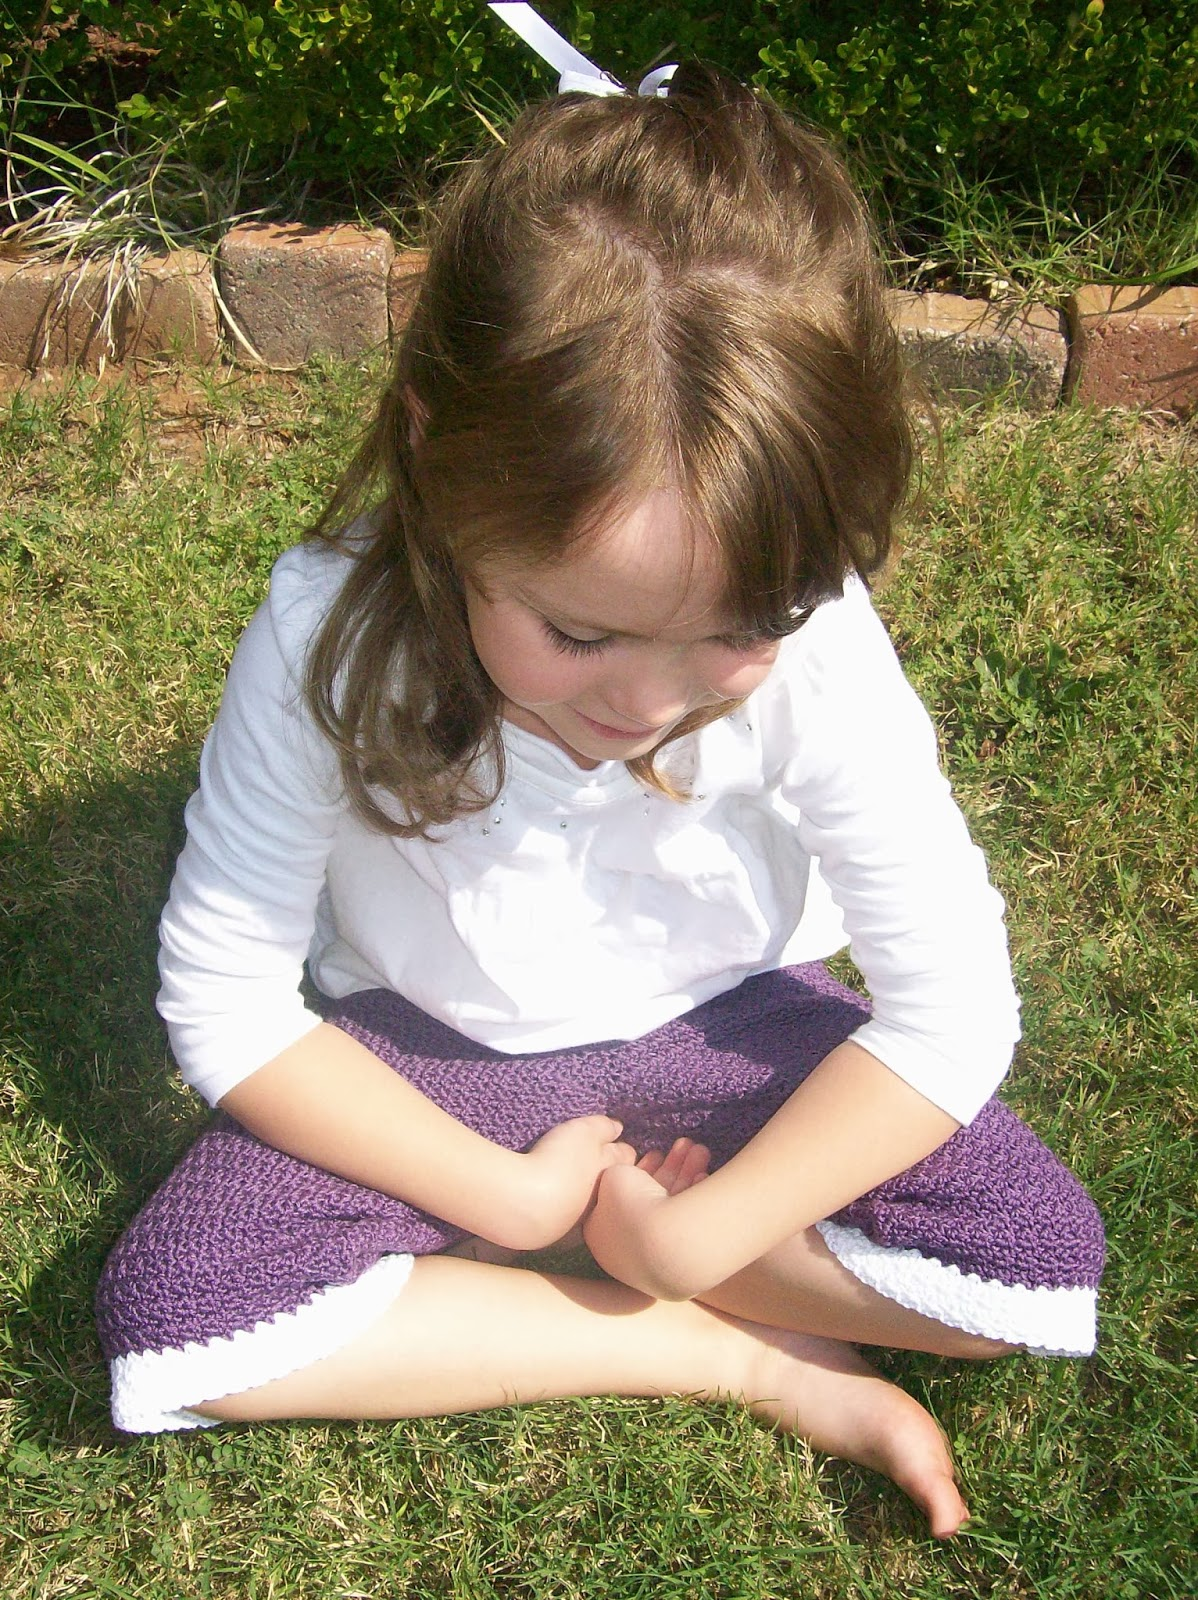 Girl sitting in the grass wearing a white shirt and purple crochet capri pants. Crochet pattern from Banana Moon Studio.